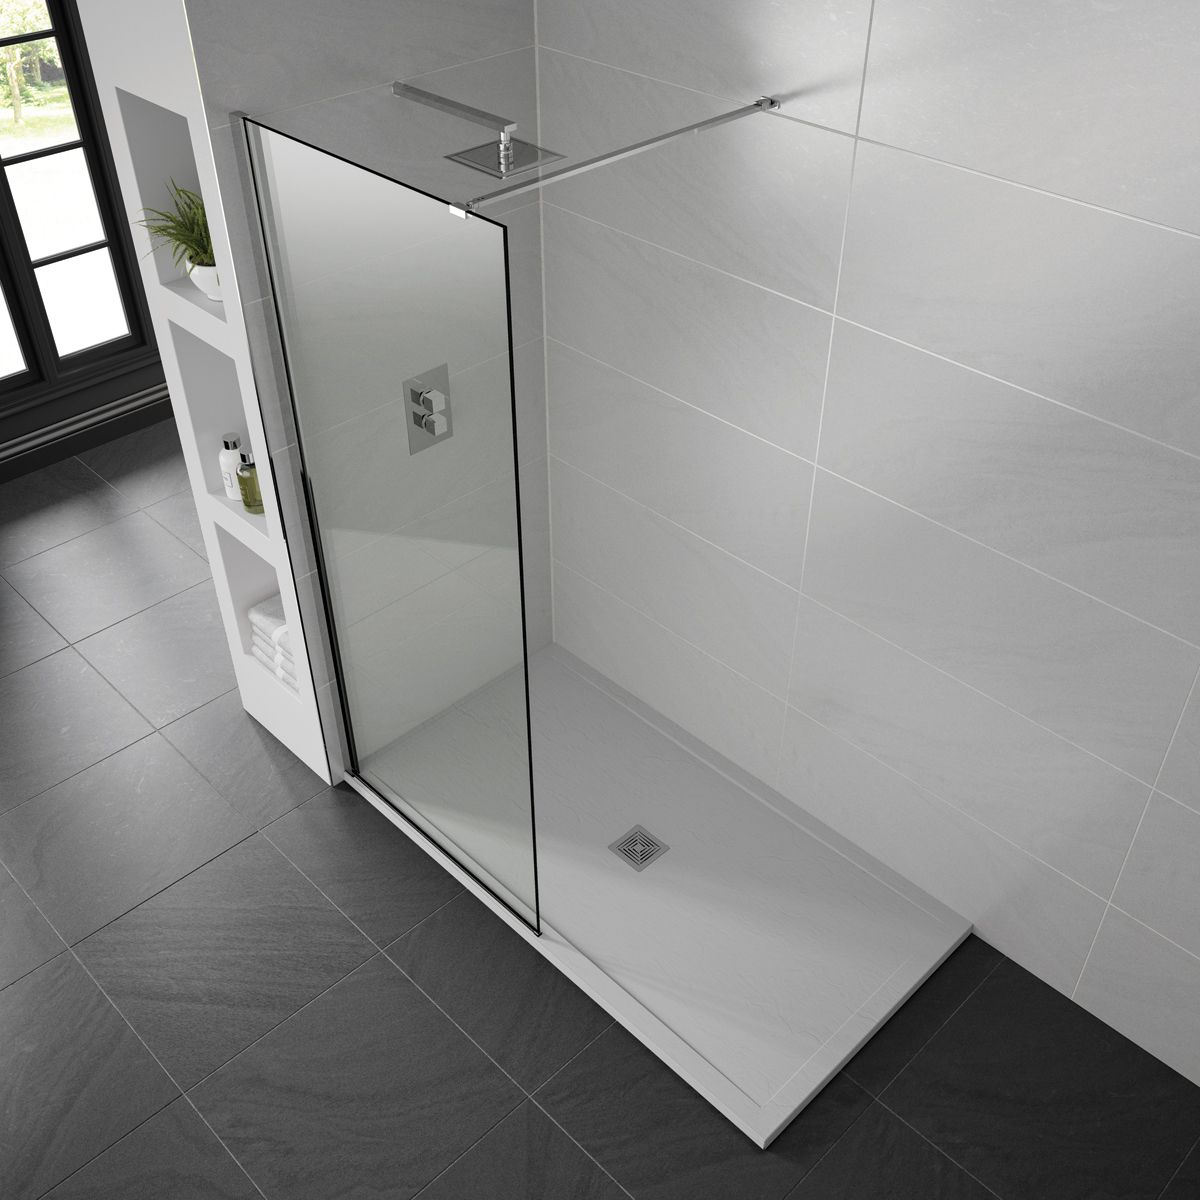 Aquadart White Slate Shower Tray 1400 x 900 Lifestyle